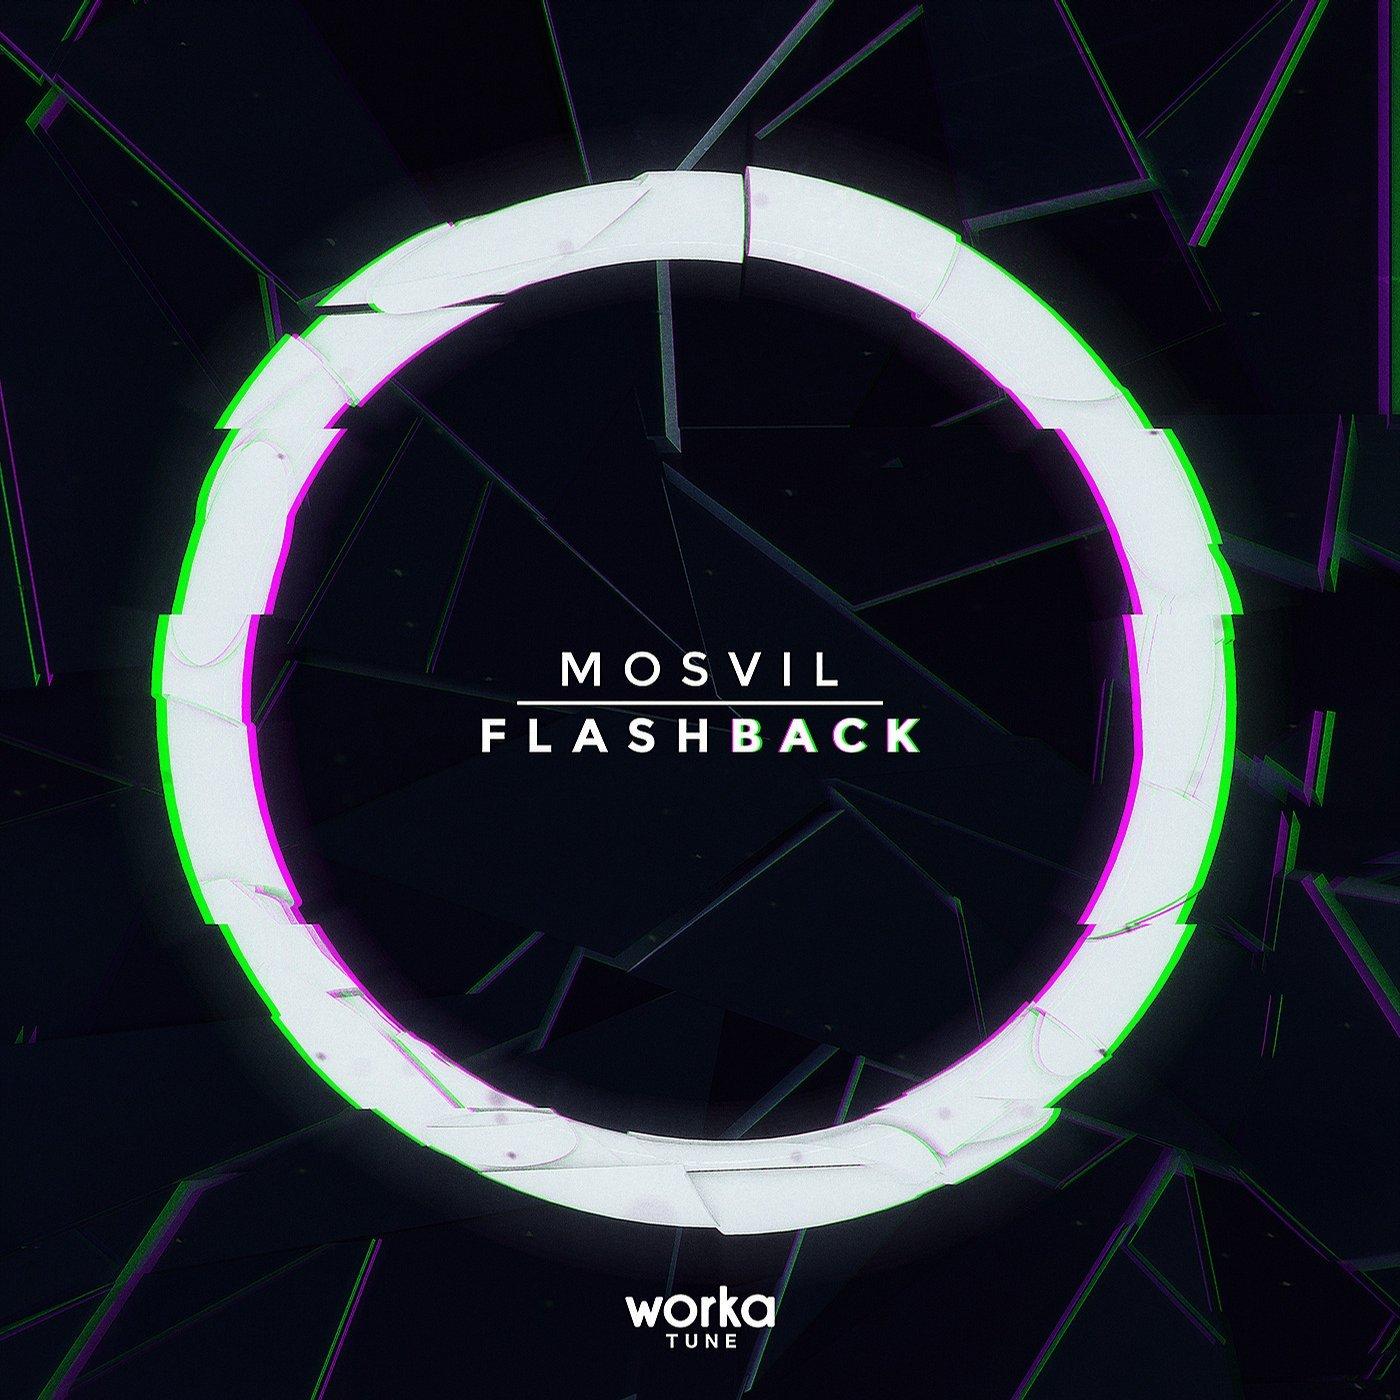 mosvil flashback worka tune records 2016